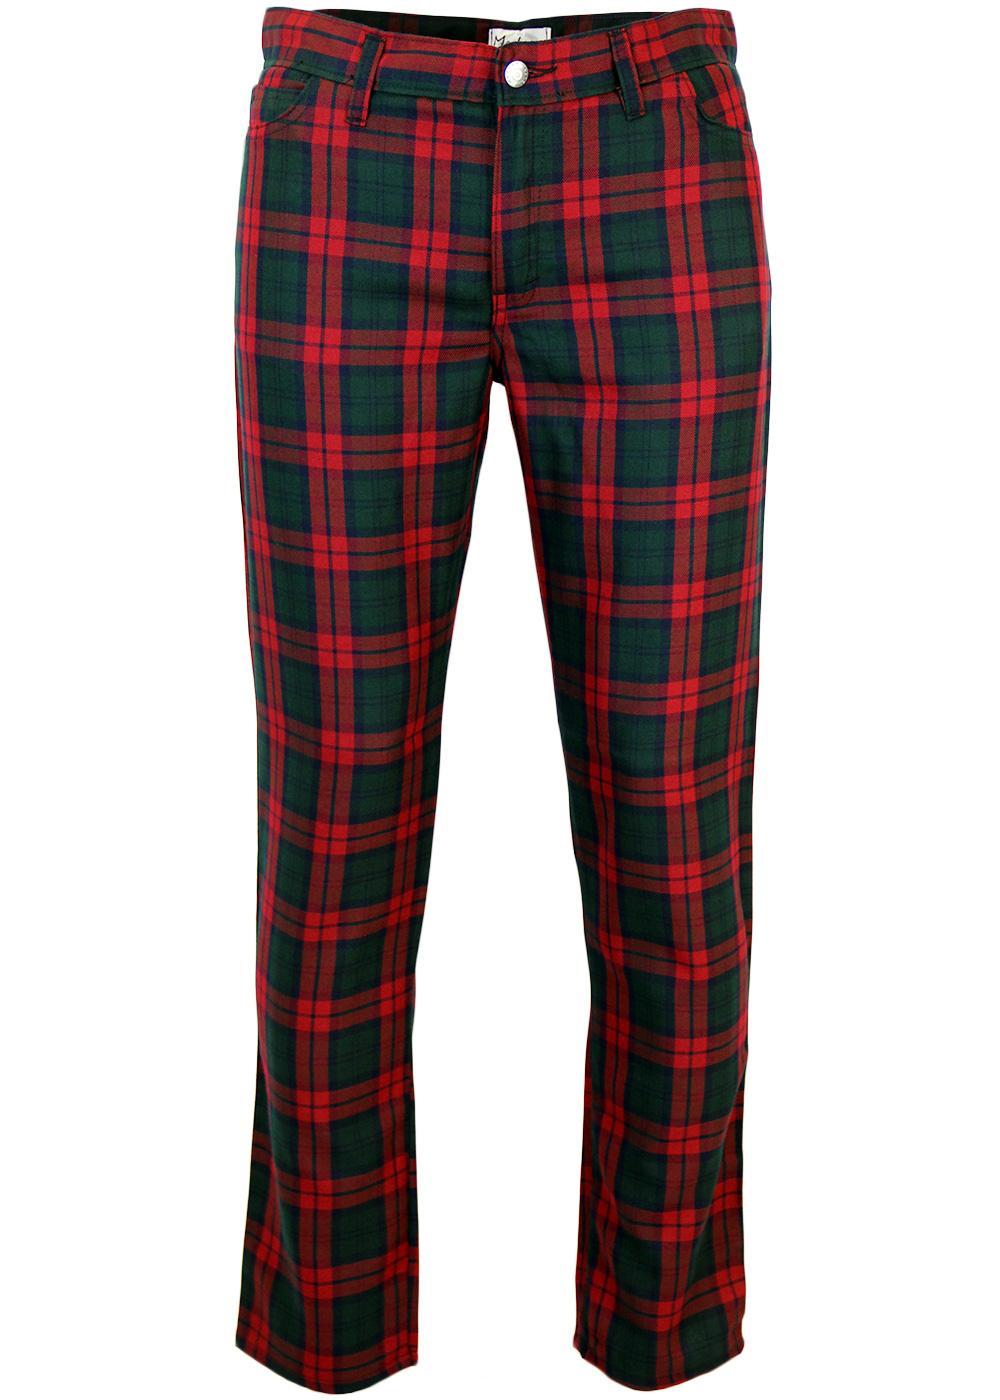 Tartan Trews MADCAP ENGLAND Retro Mod Trousers BR